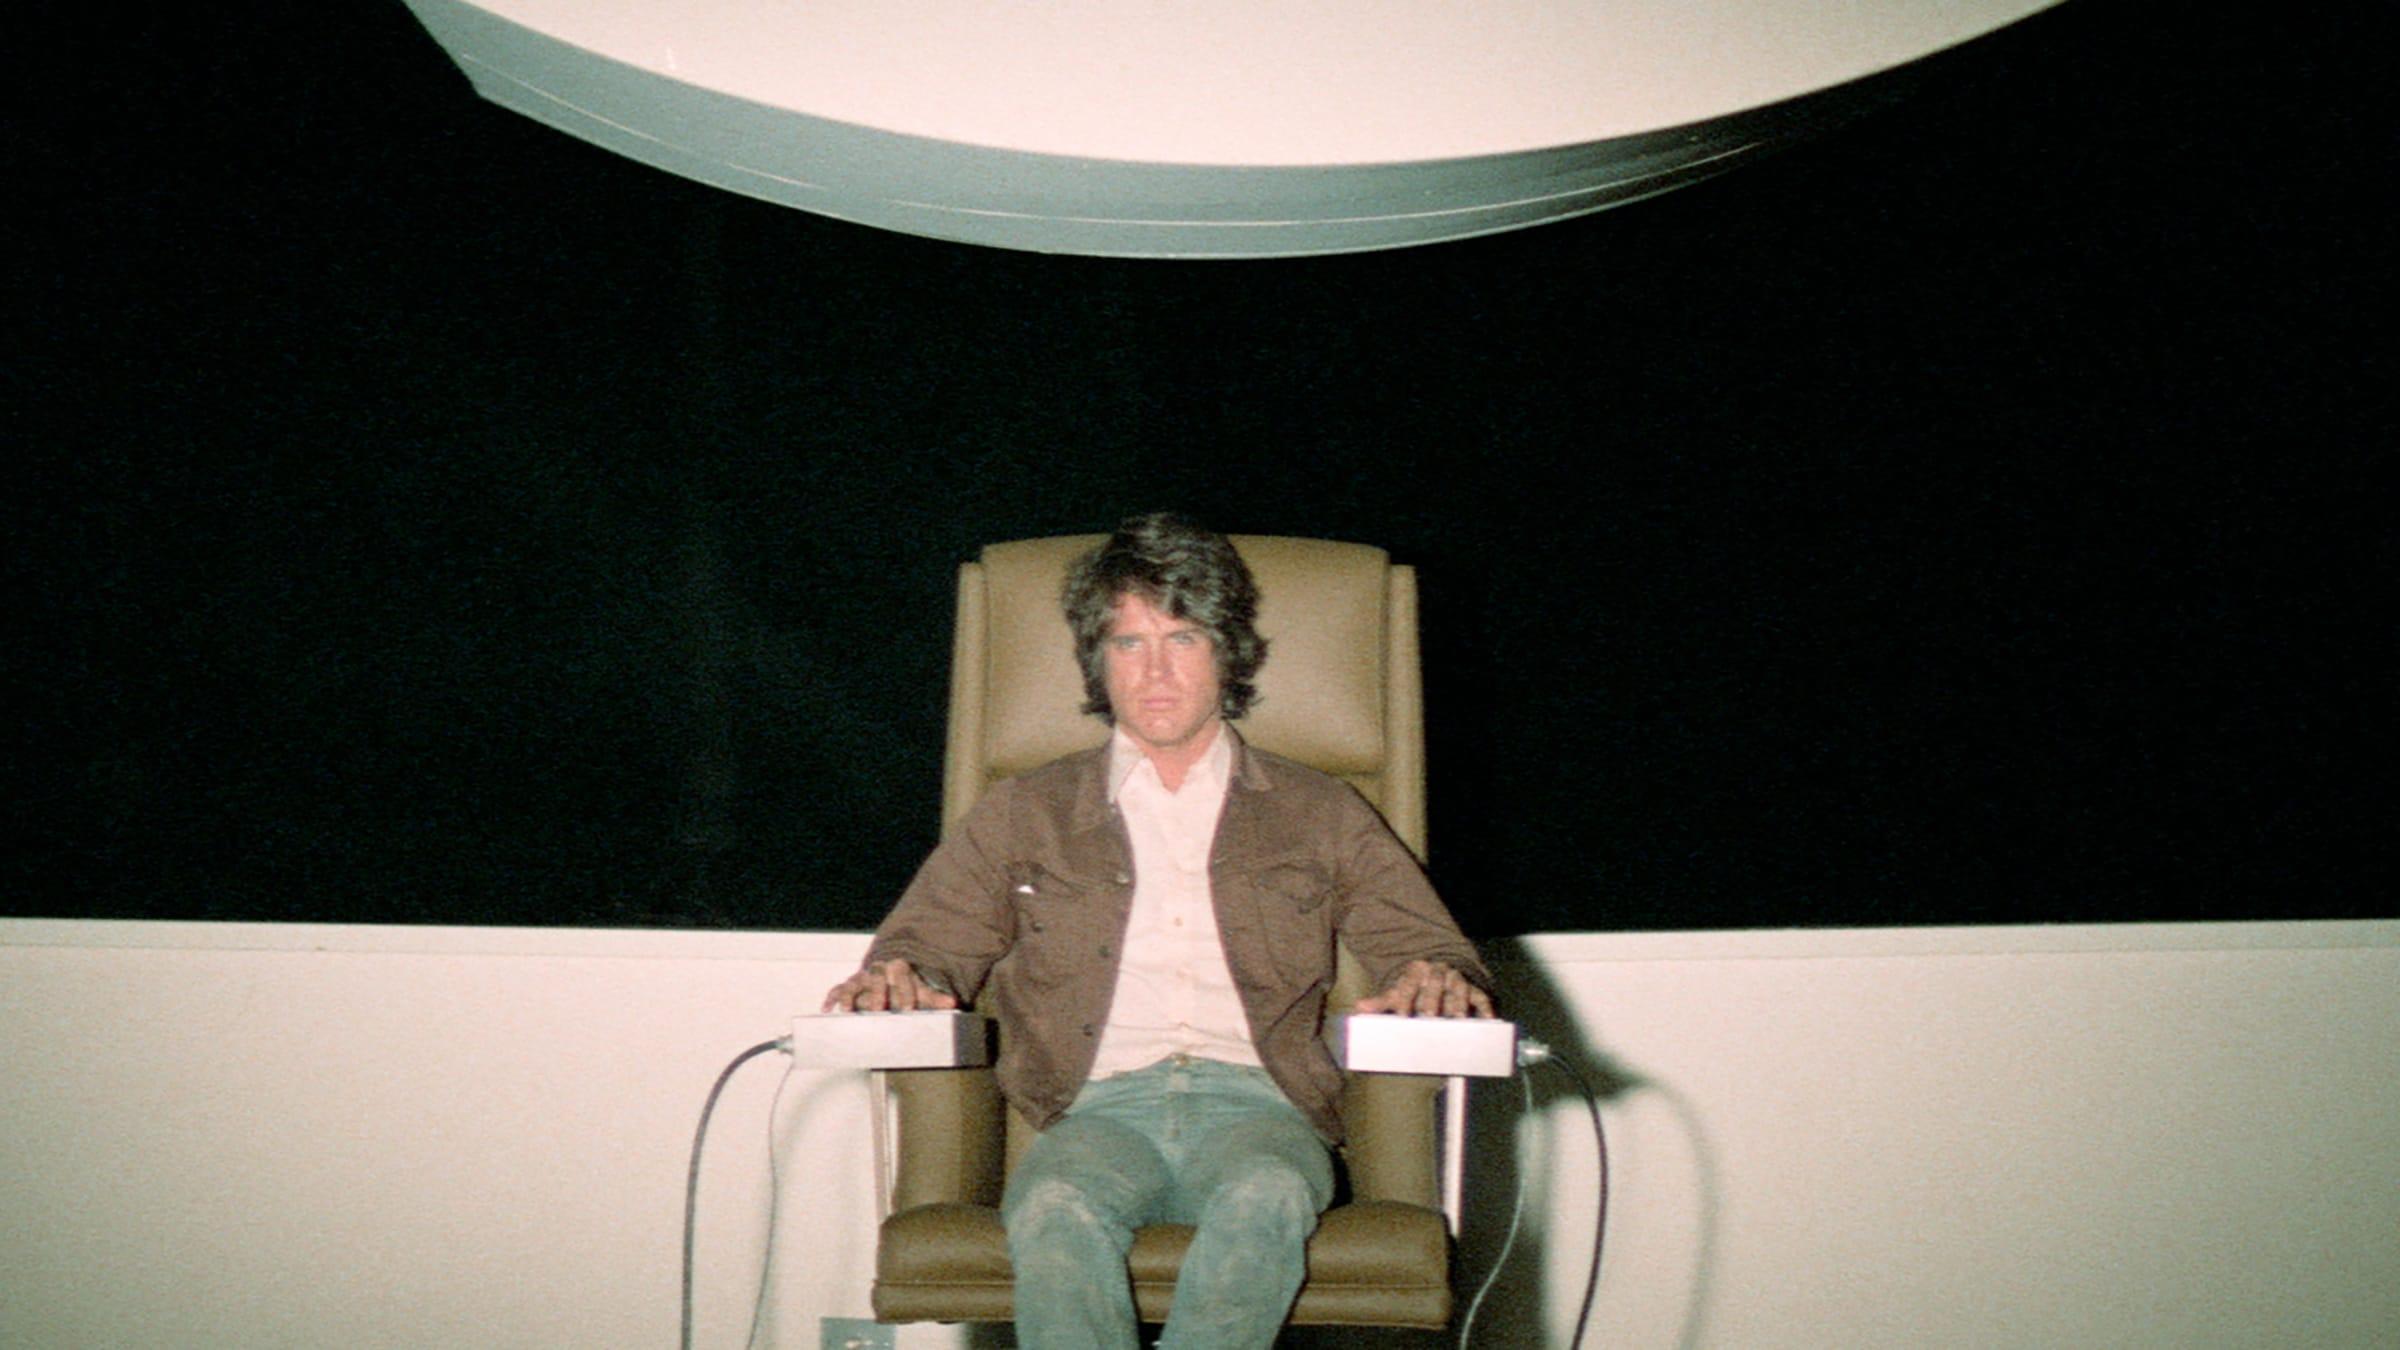 Michael Small, Film Music's Prince of Paranoia